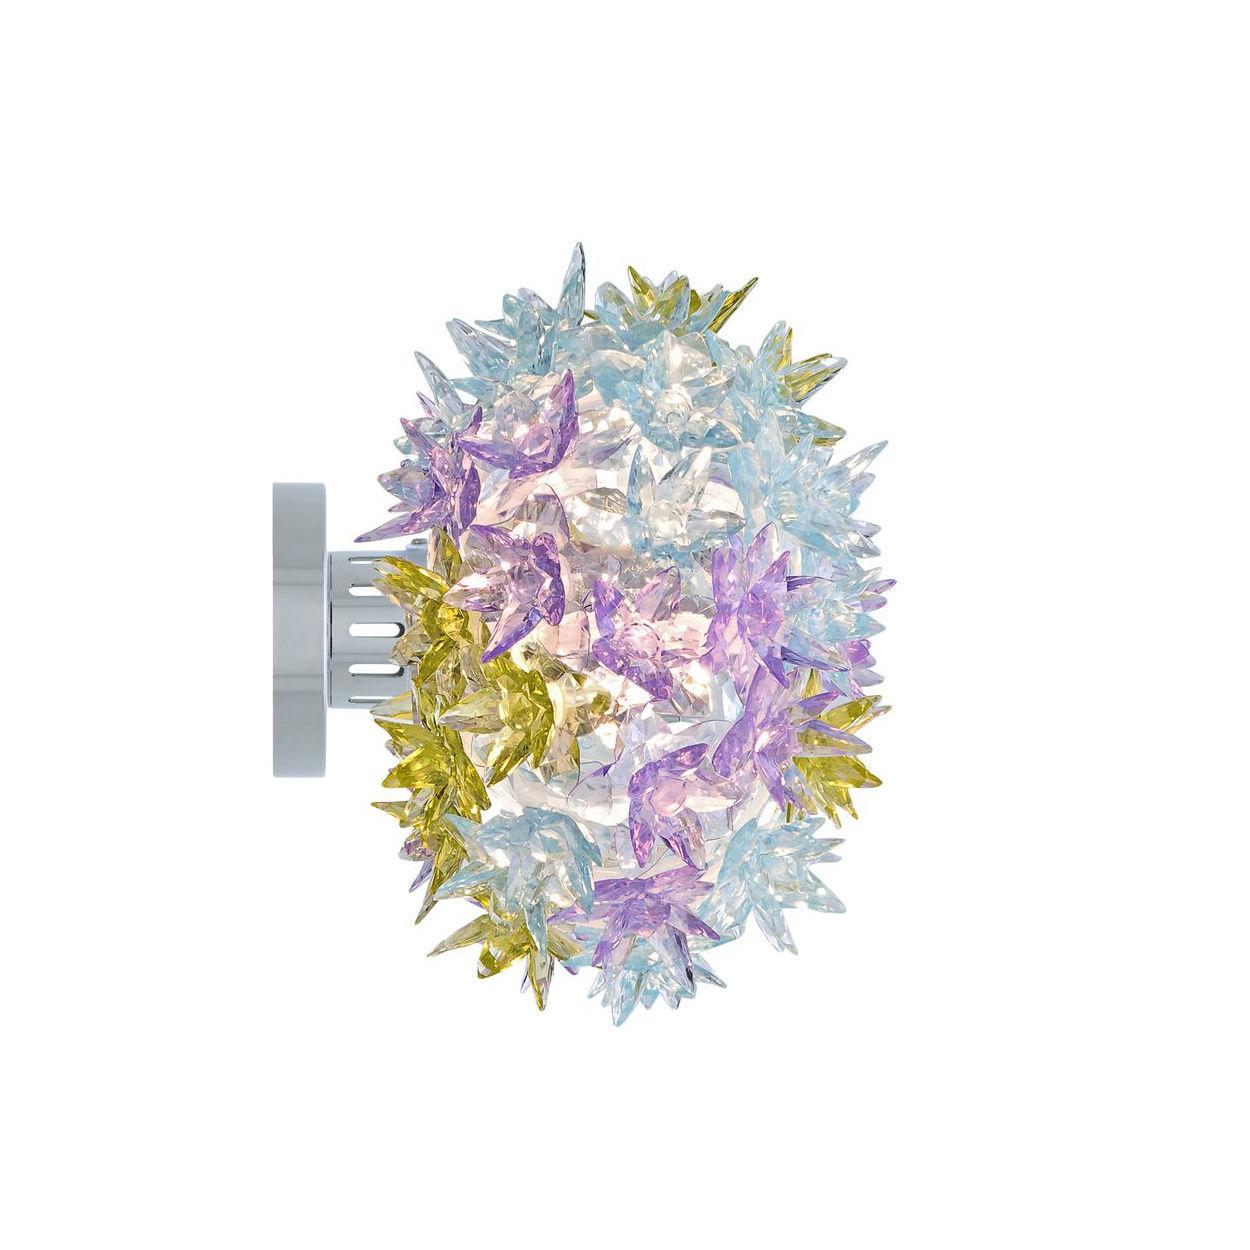 Bloom wandlamp Kartell lavendel